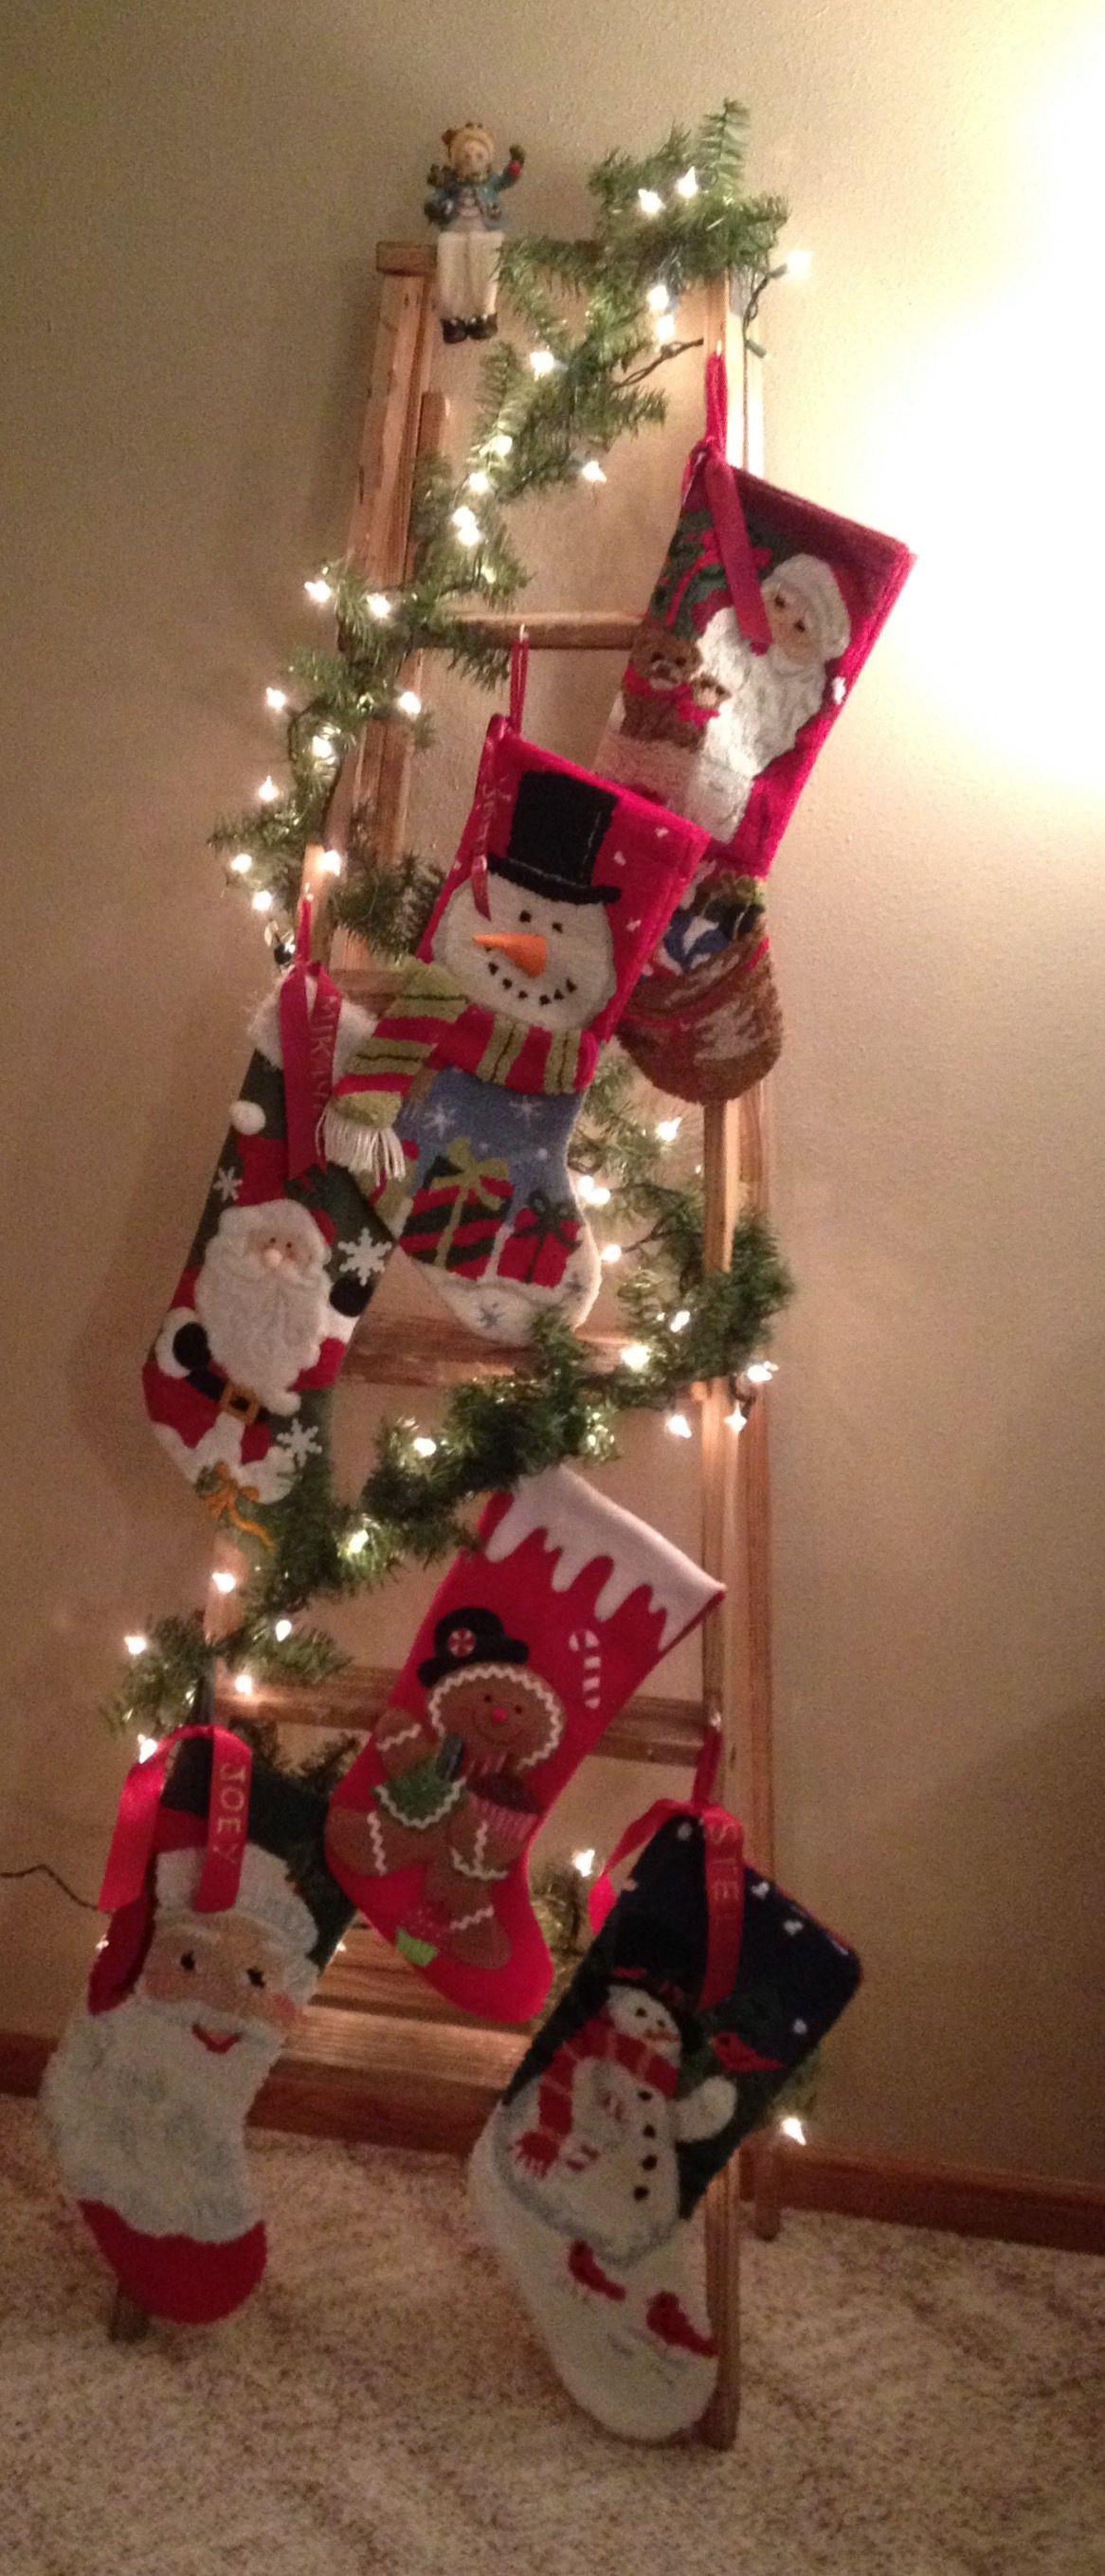 My Christmas Stocking Ladder 2016 Christmas decor diy